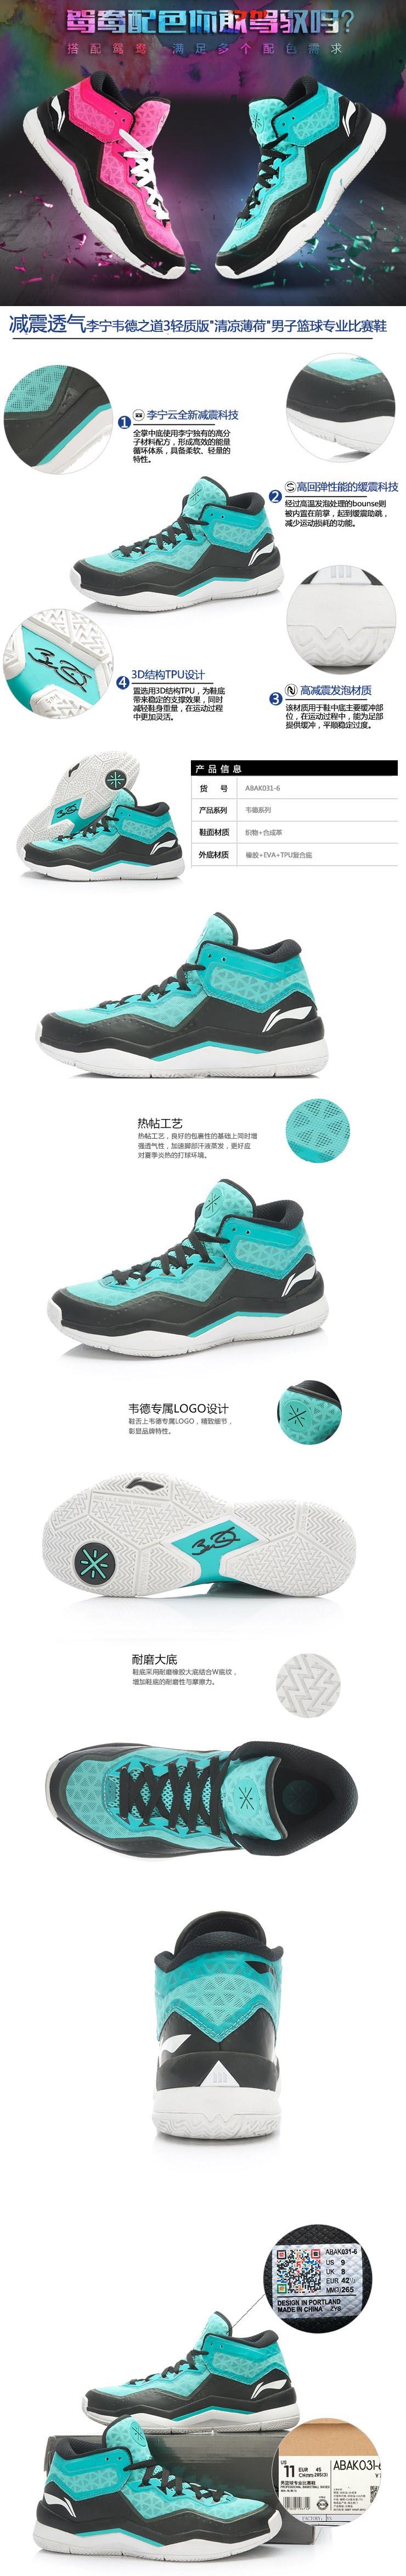 Li-Ning WoW Way of Wade 3 Lite 'Cool Mint'